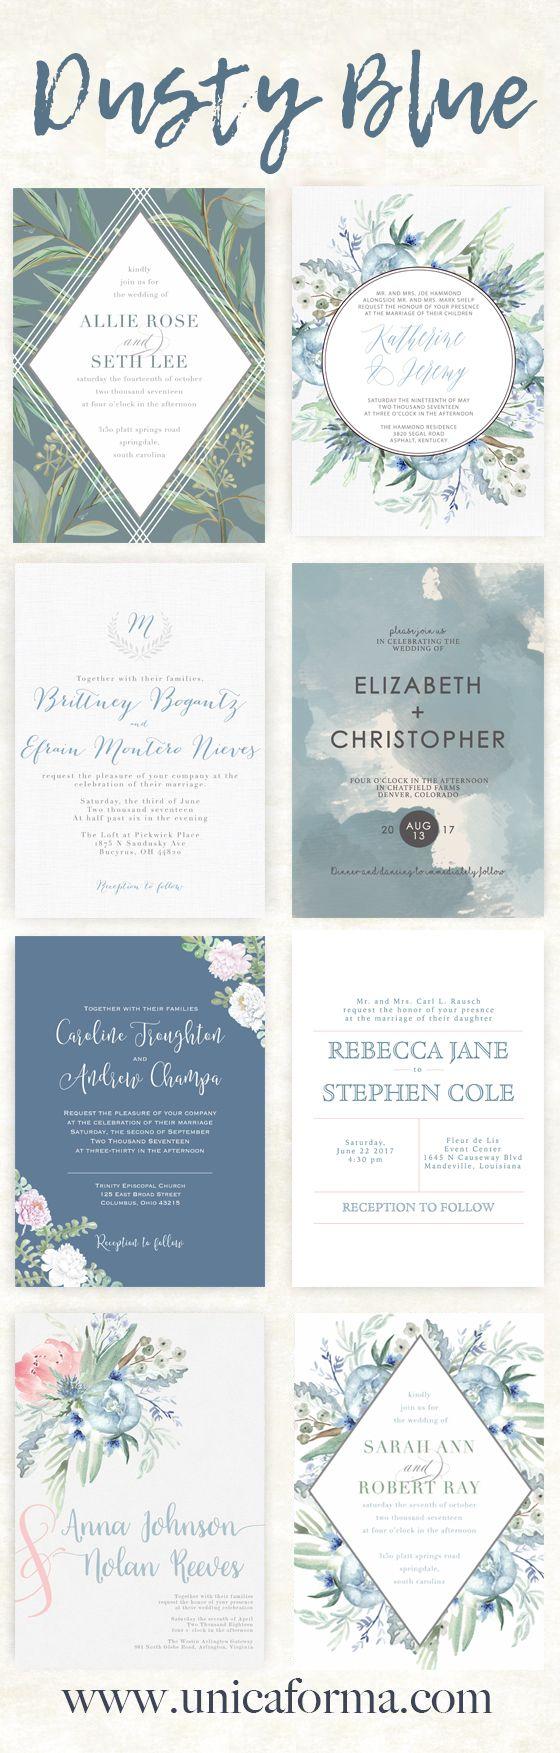 Dusty Blue Wedding Invitations Slate